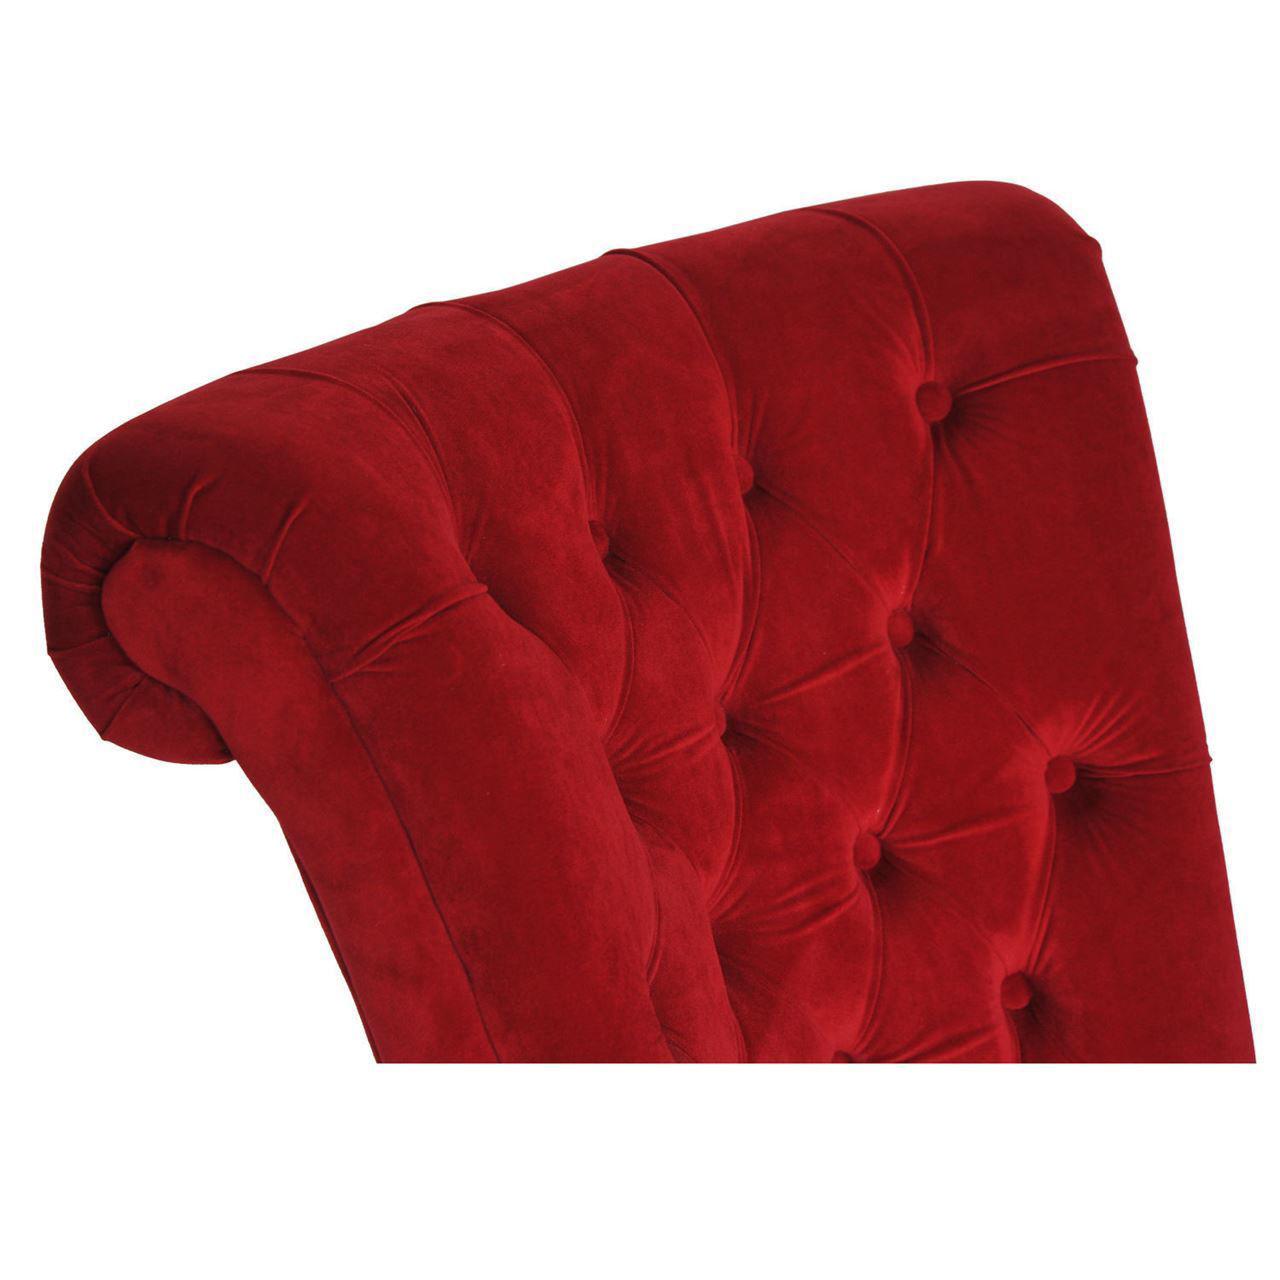 Picture of Living Room Velvet Chair - Red